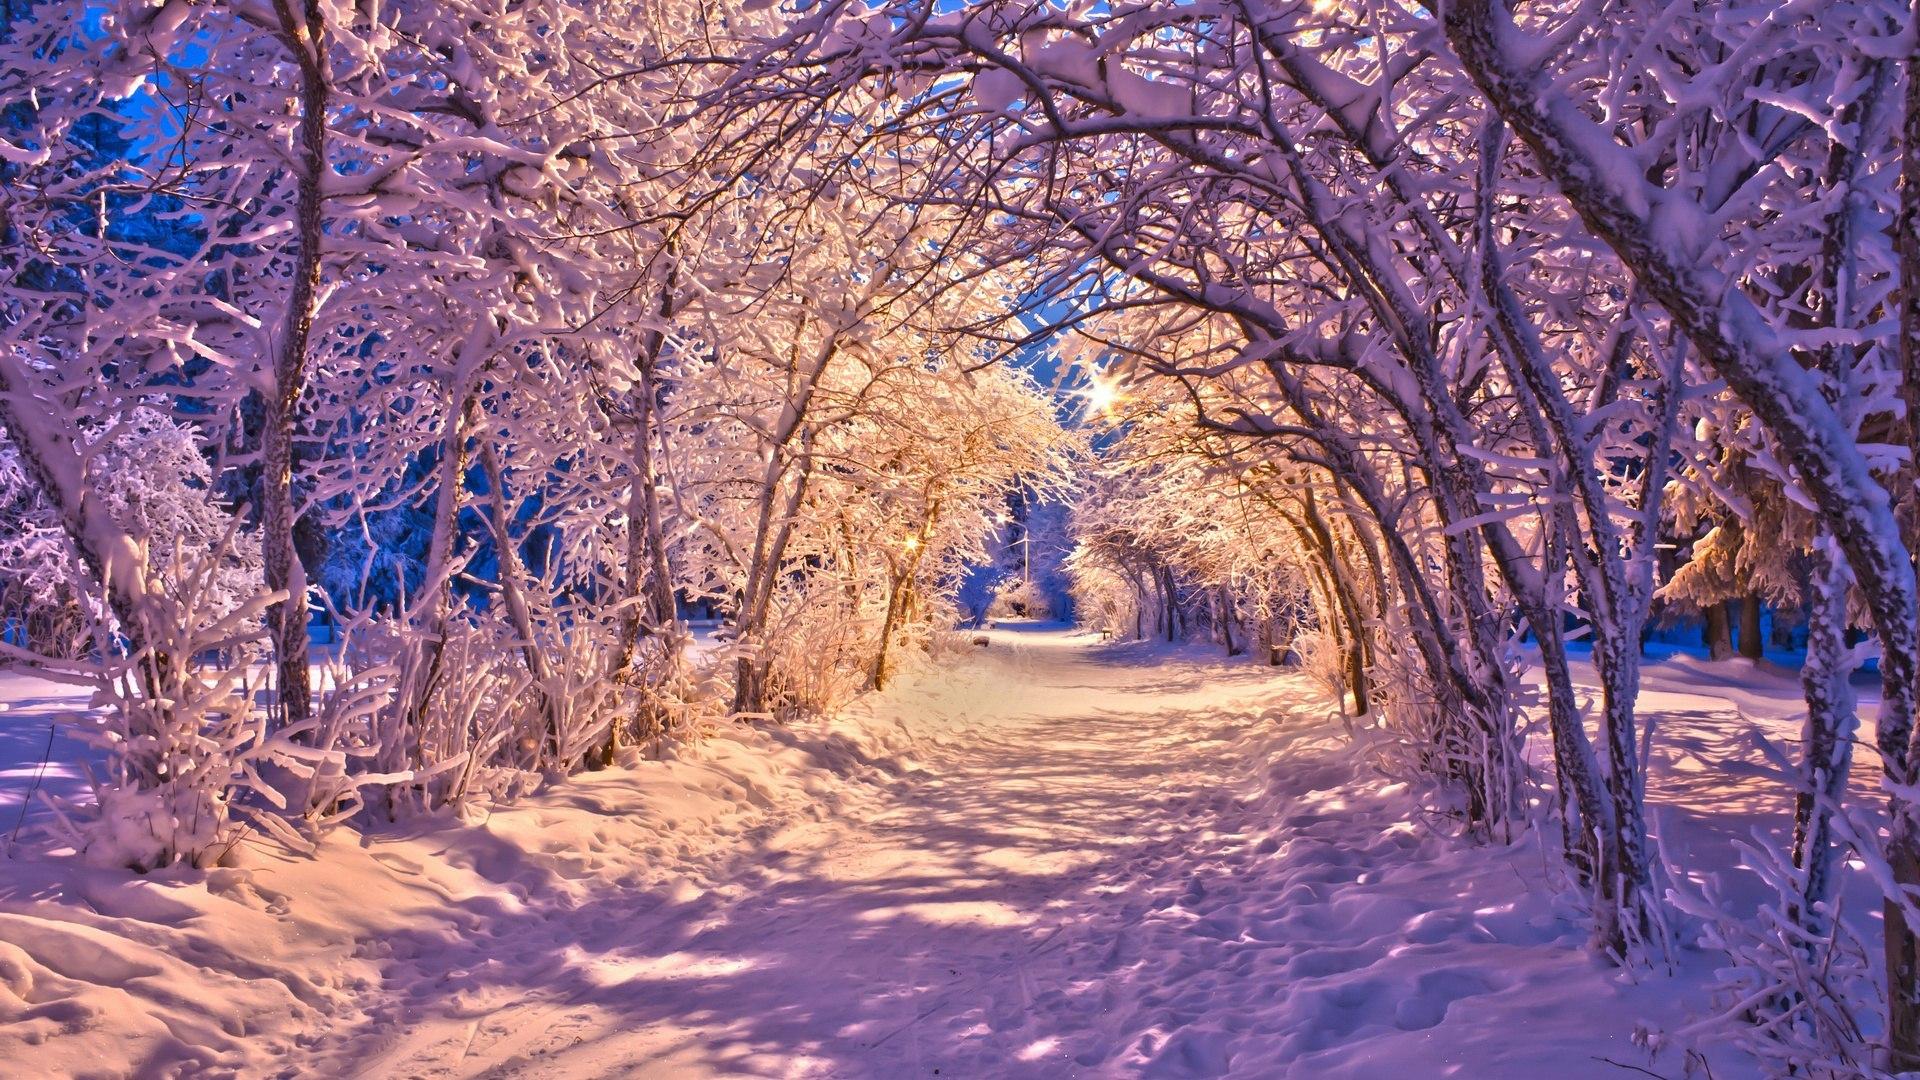 Картинка: Зима, снег, лес, тень, дорожка, вечер